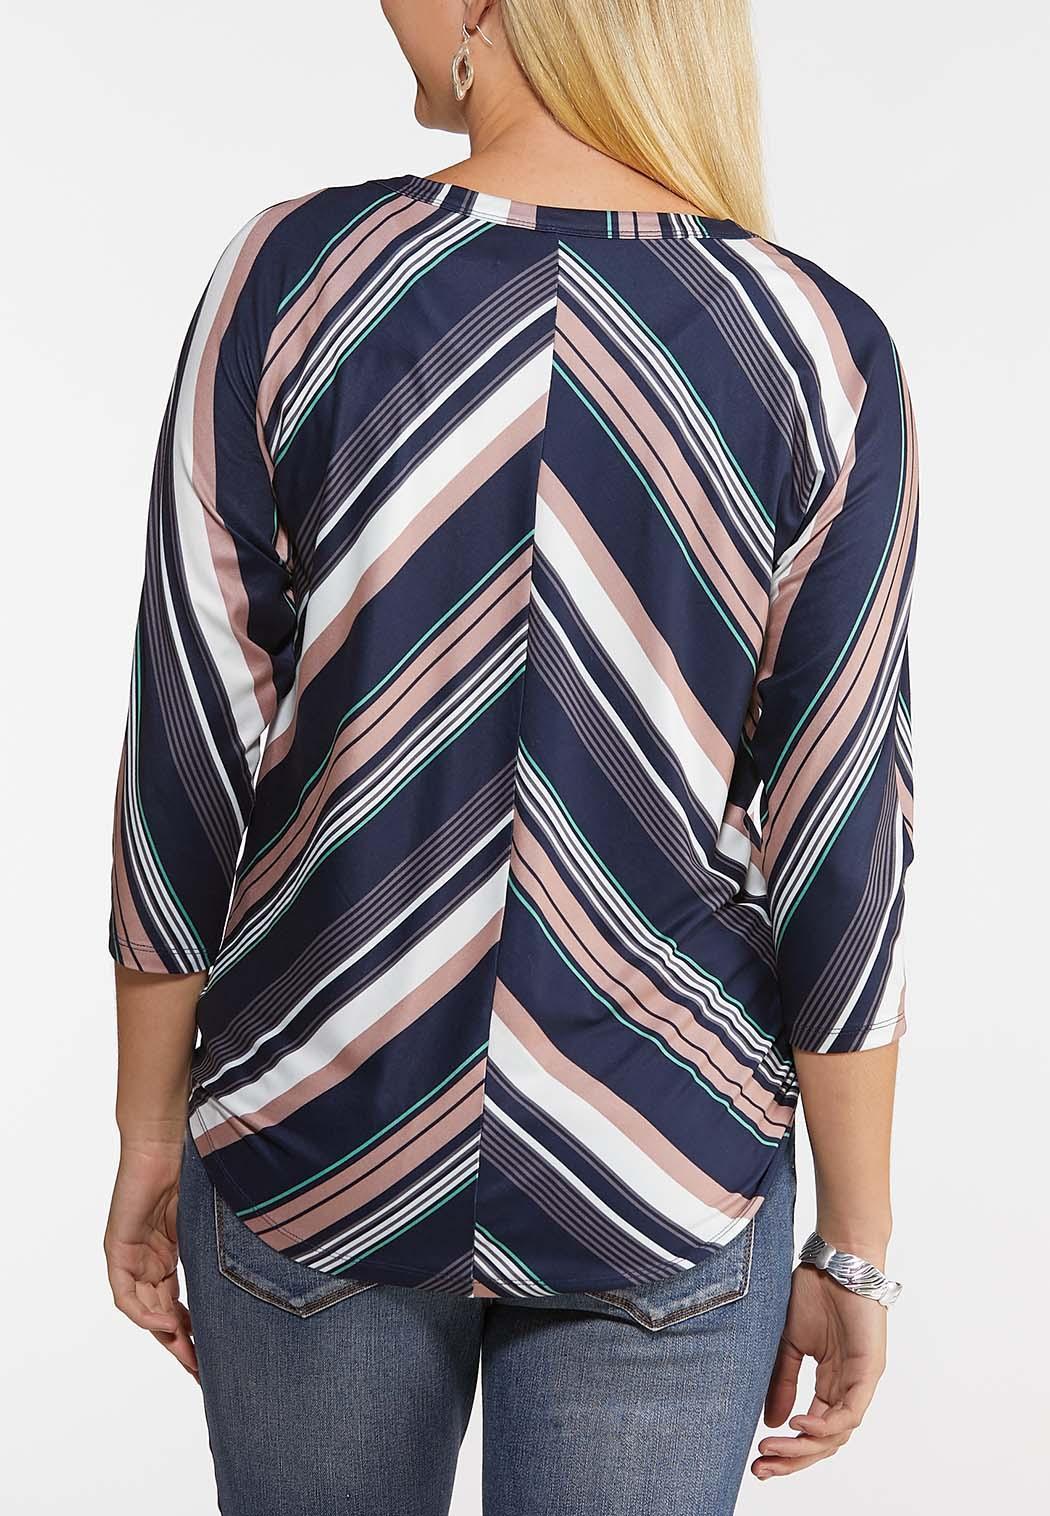 Mitered Multi Stripe Top (Item #44088977)